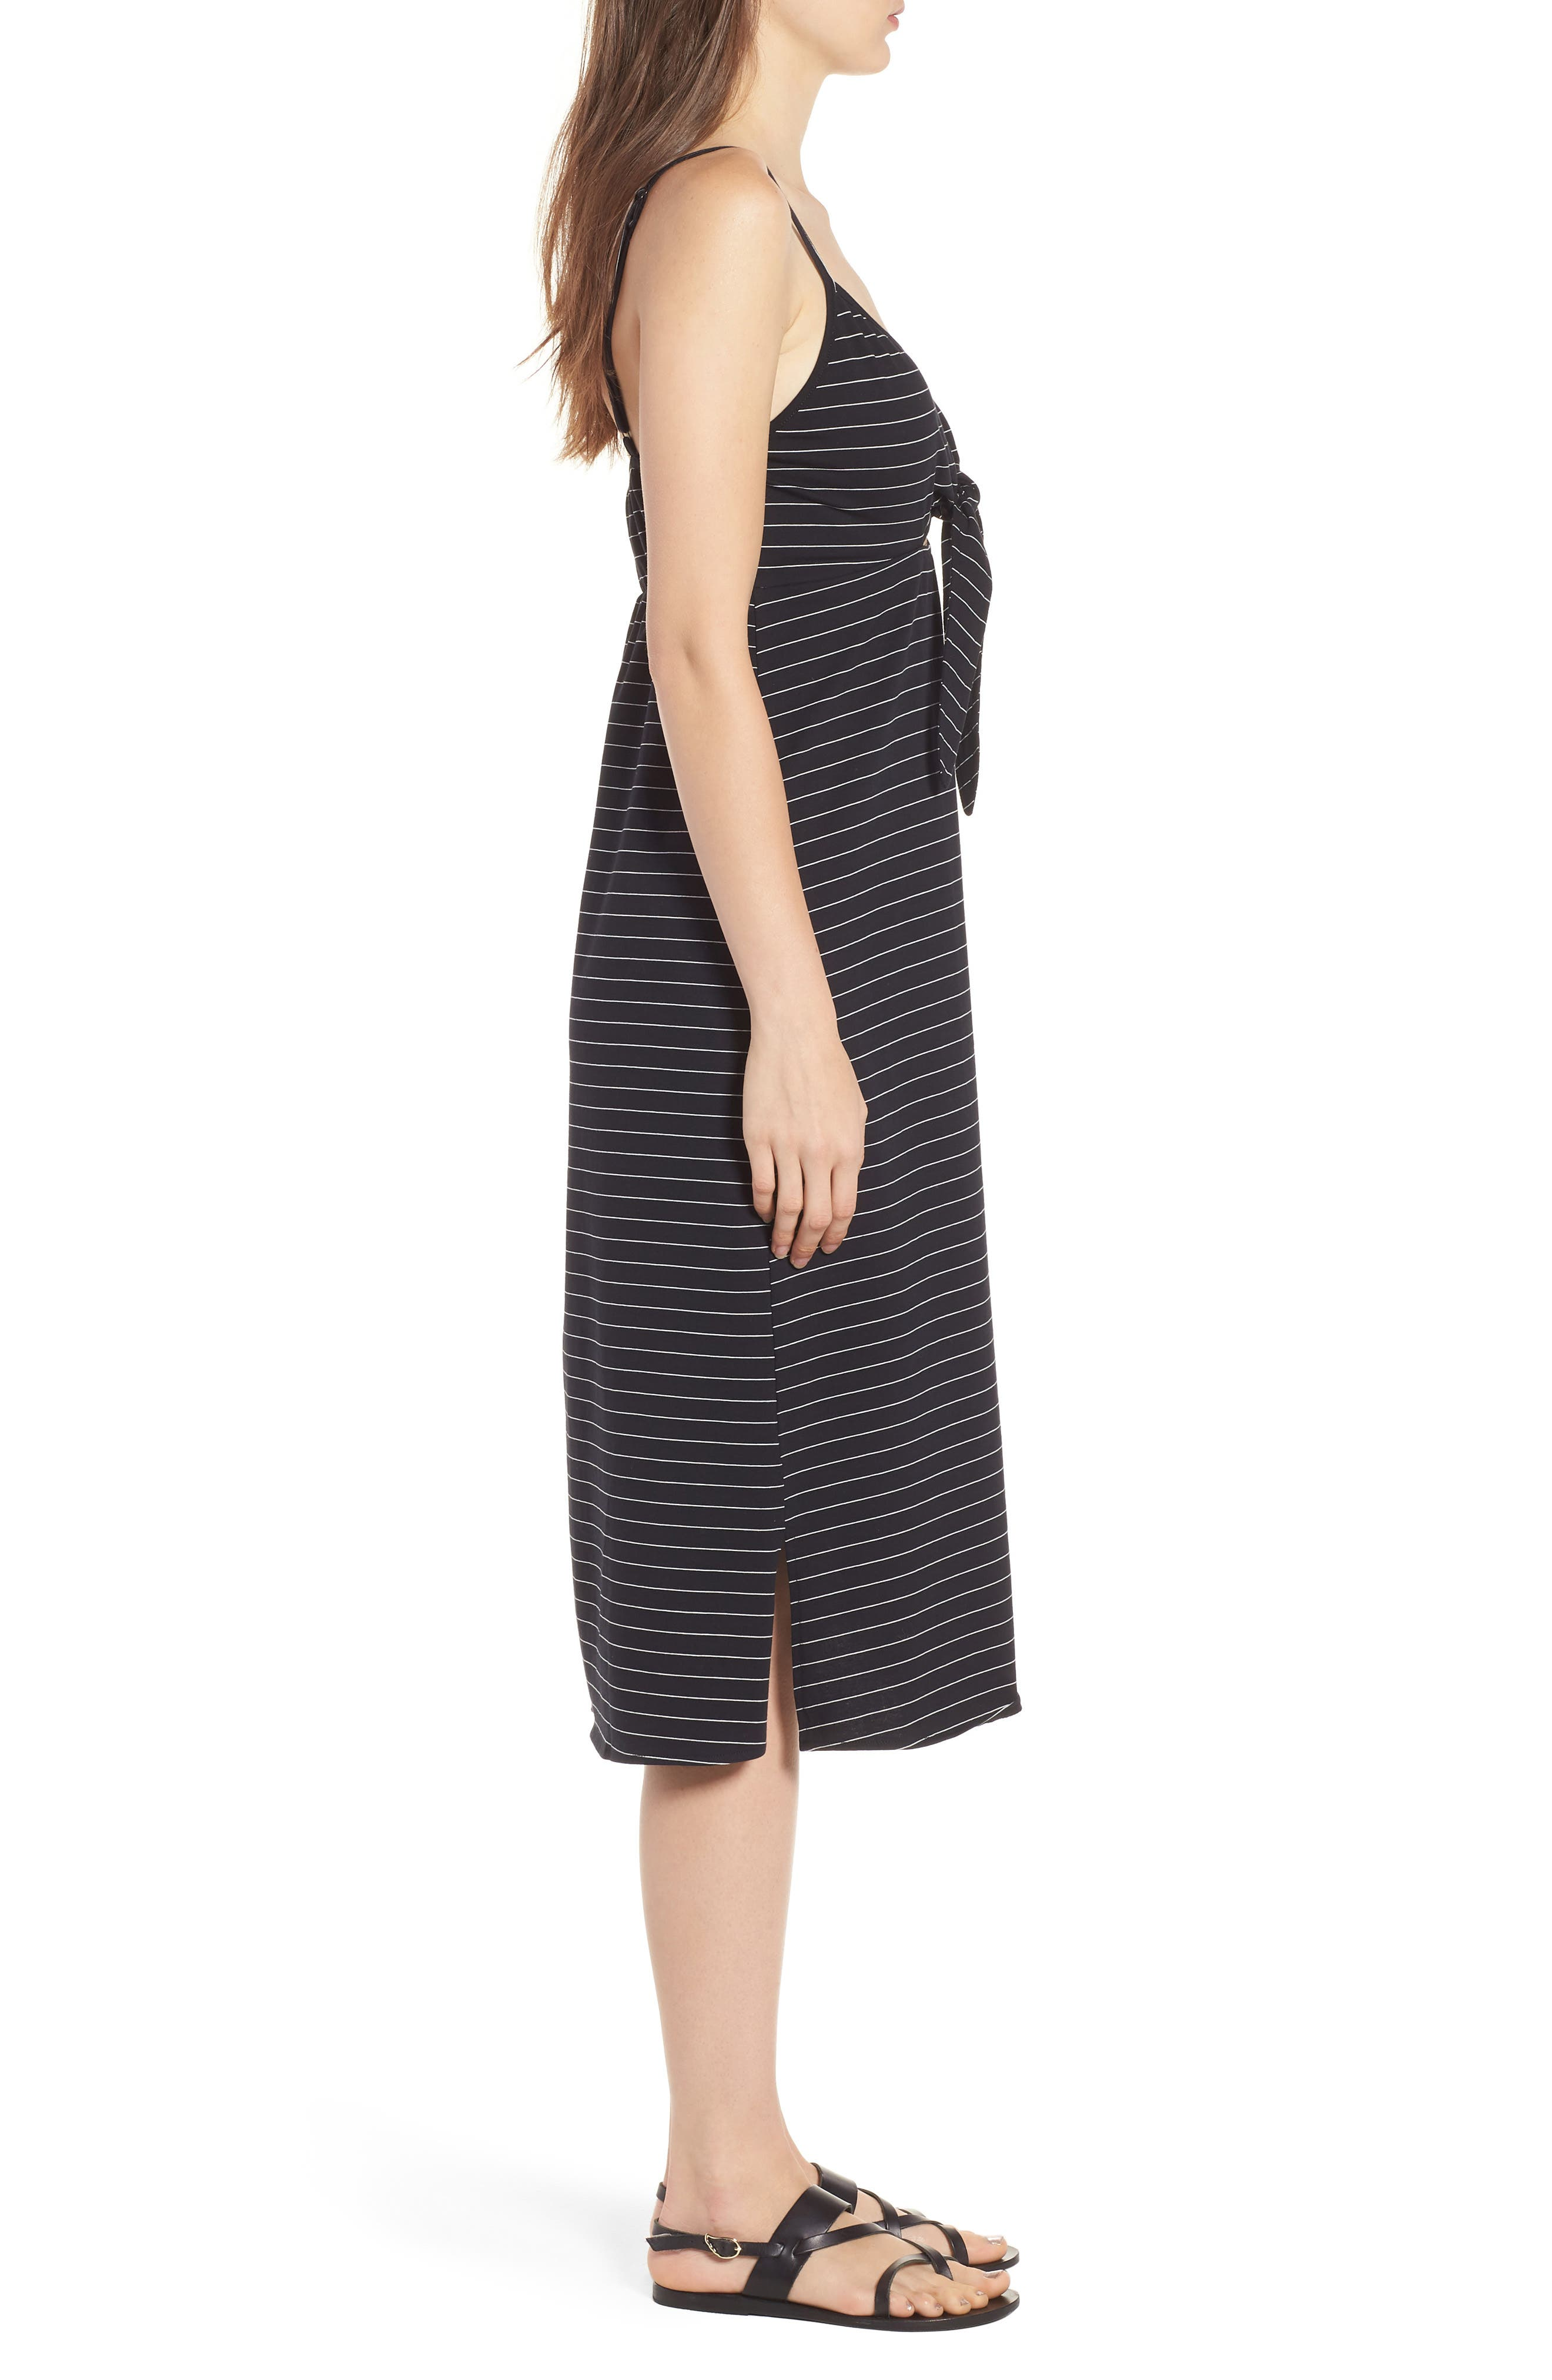 Suzanne Knot Front Dress,                             Alternate thumbnail 4, color,                             Black